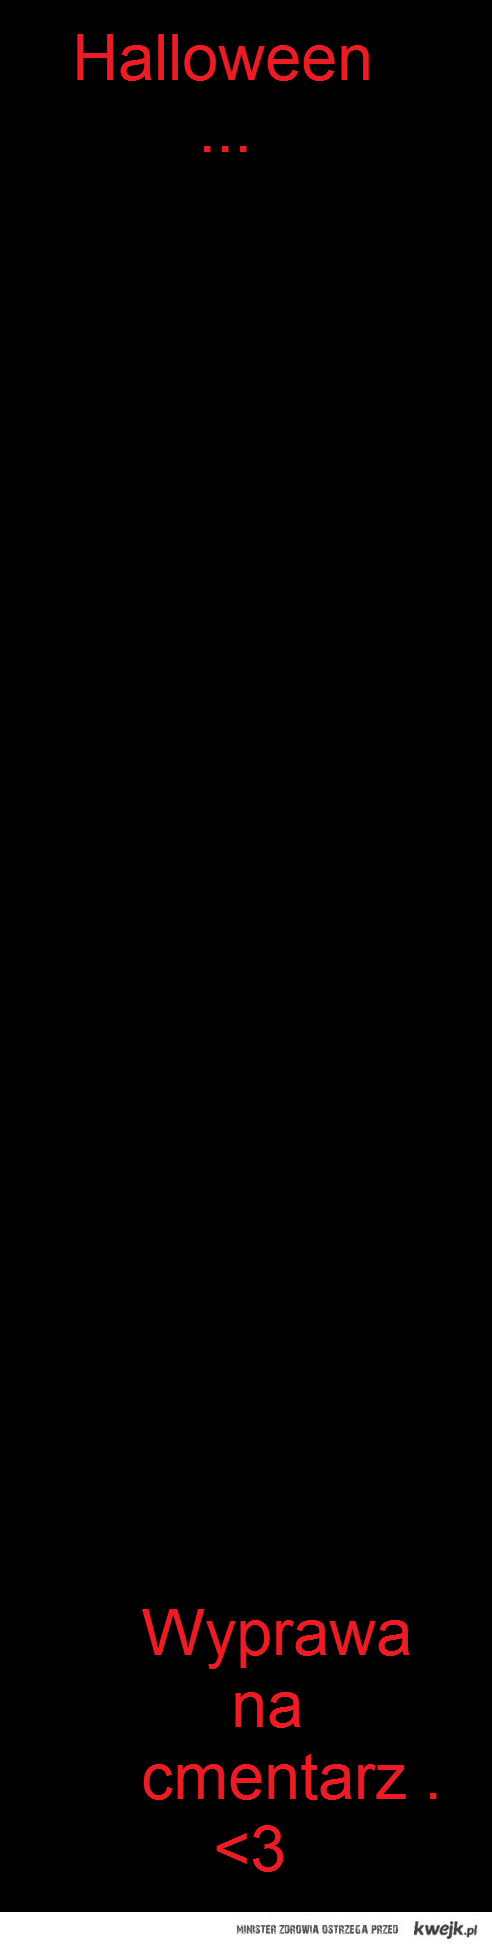 mrau <3